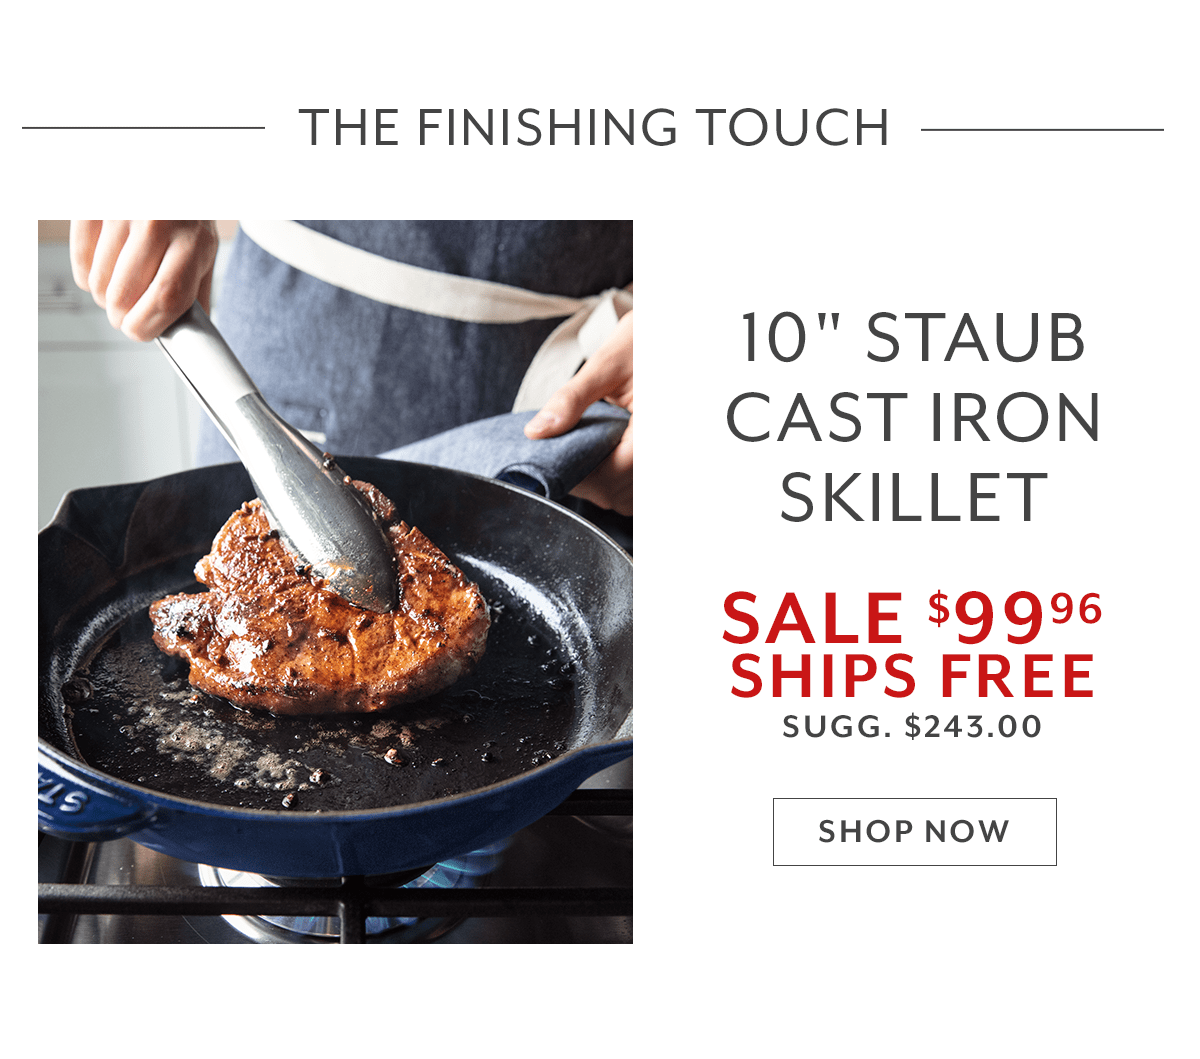 Staub Cast Iron Skillet